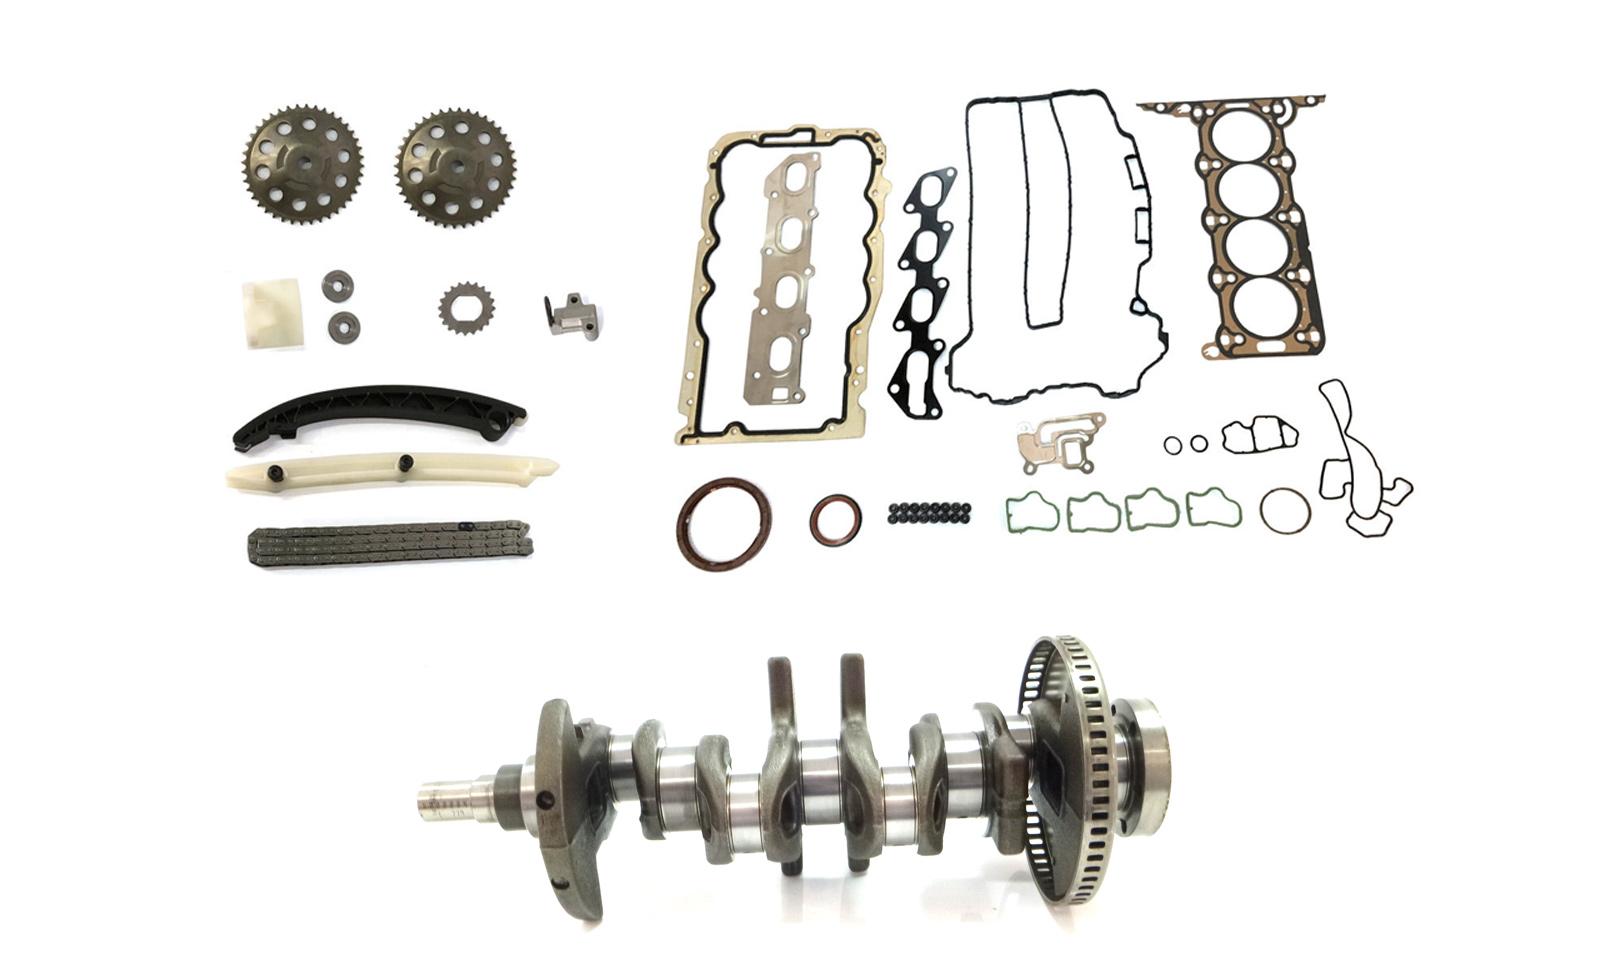 Kurbelwelle Kettensatz Opel Astra Combo Corsa 1,4 16V Z14XEL Z14XEP 24450968 NEU